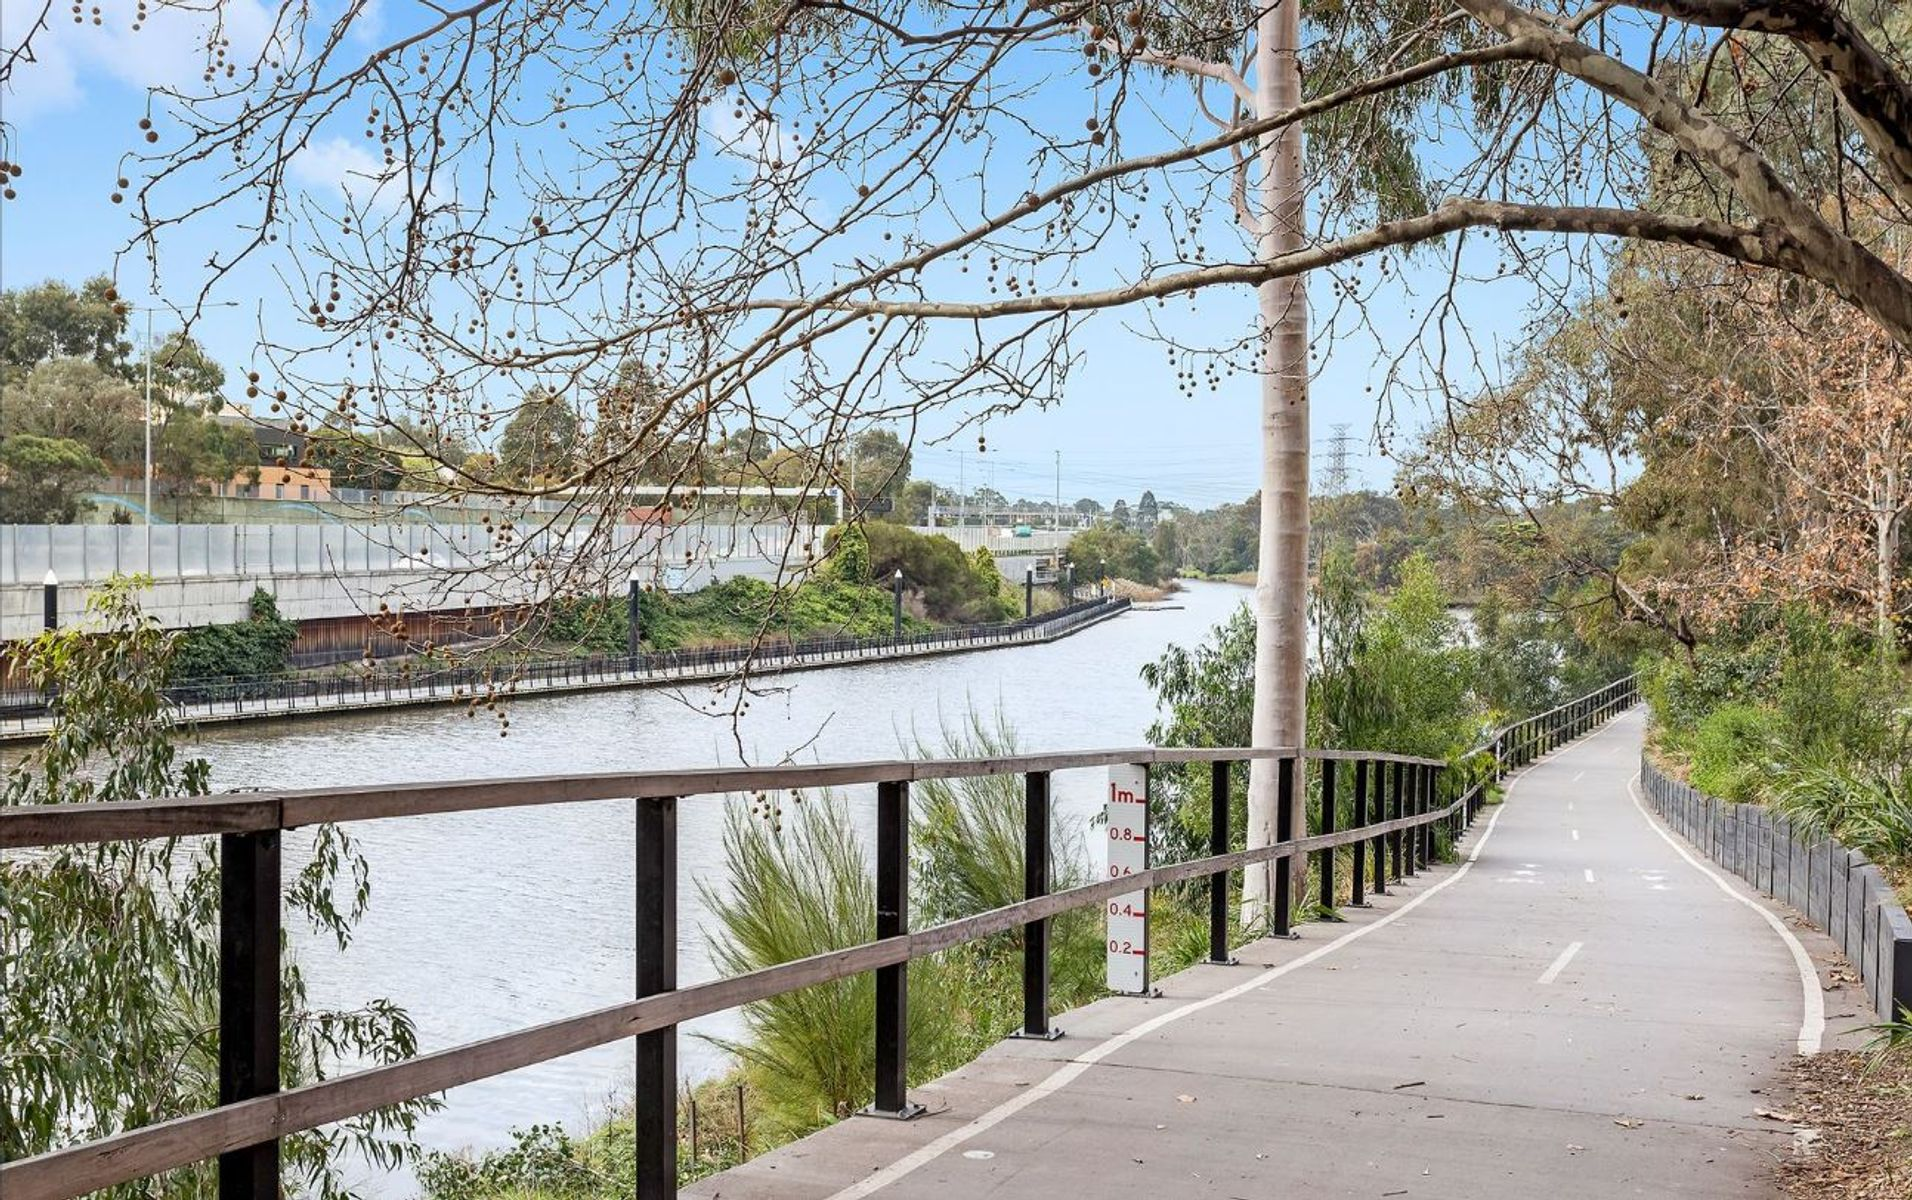 Yarra River & Bike Path